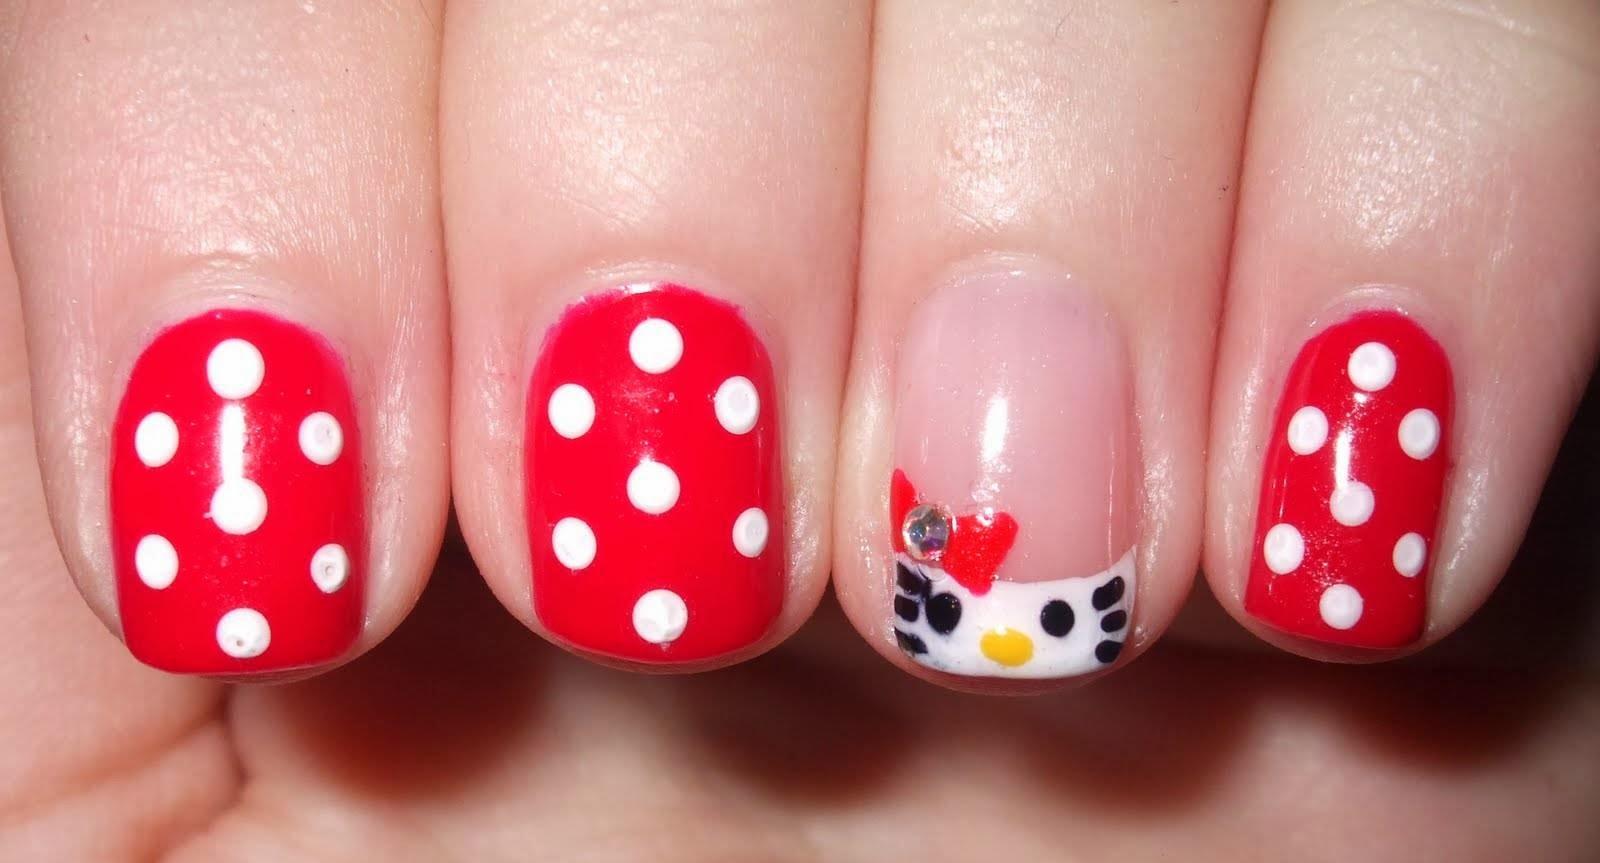 Amazing Nail Design | Nail Art Ideas 101